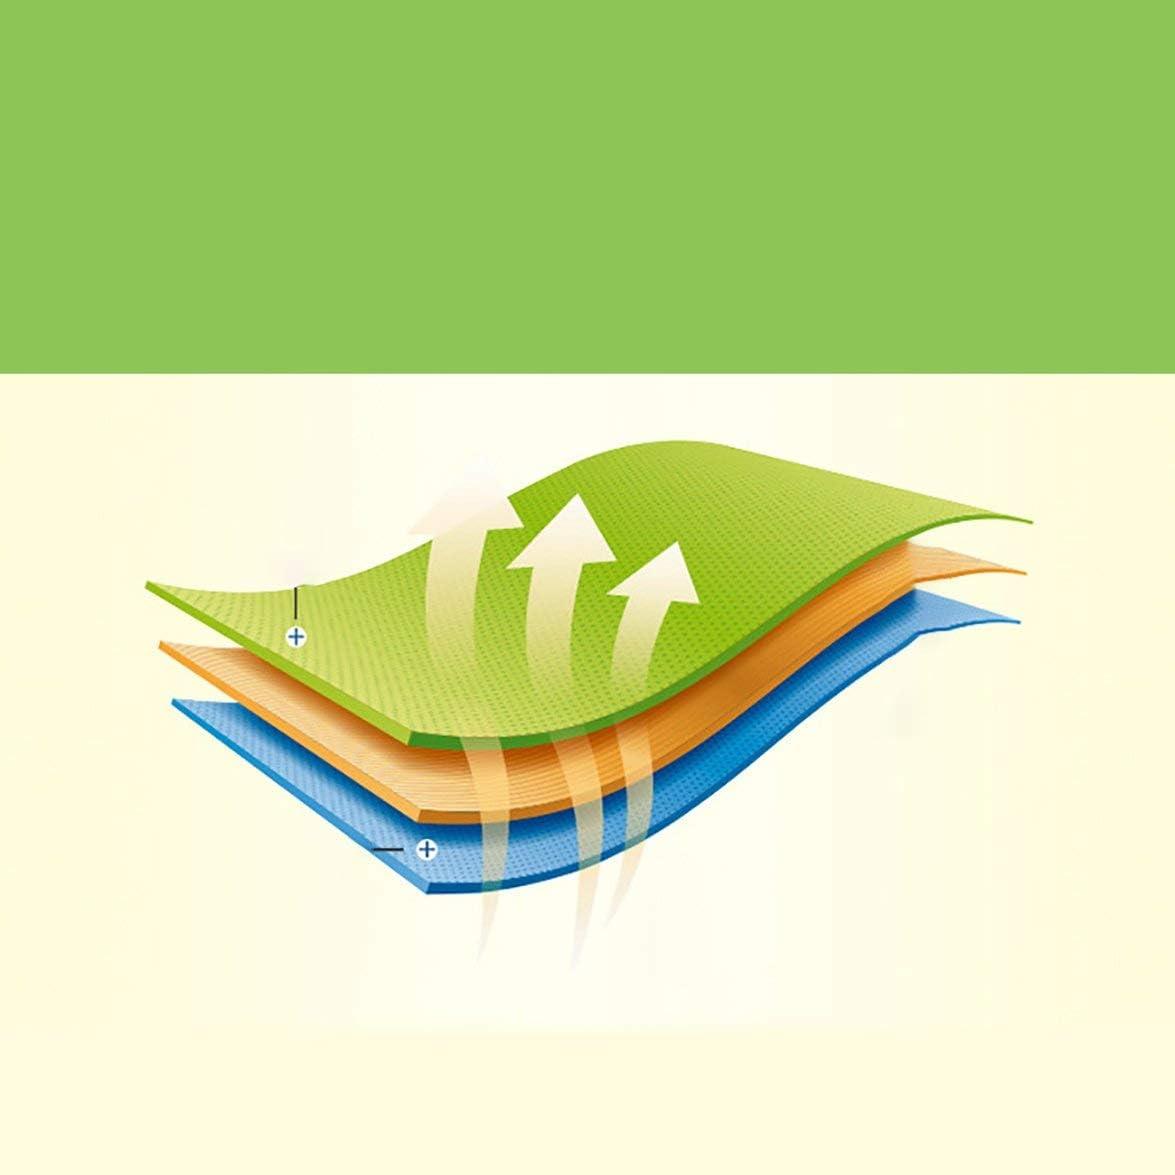 Yunshm Hand Drawn Tropical Cactus Pattern Trolley Handbag Waterproof Unisex Large Capacity For Business Travel Storage